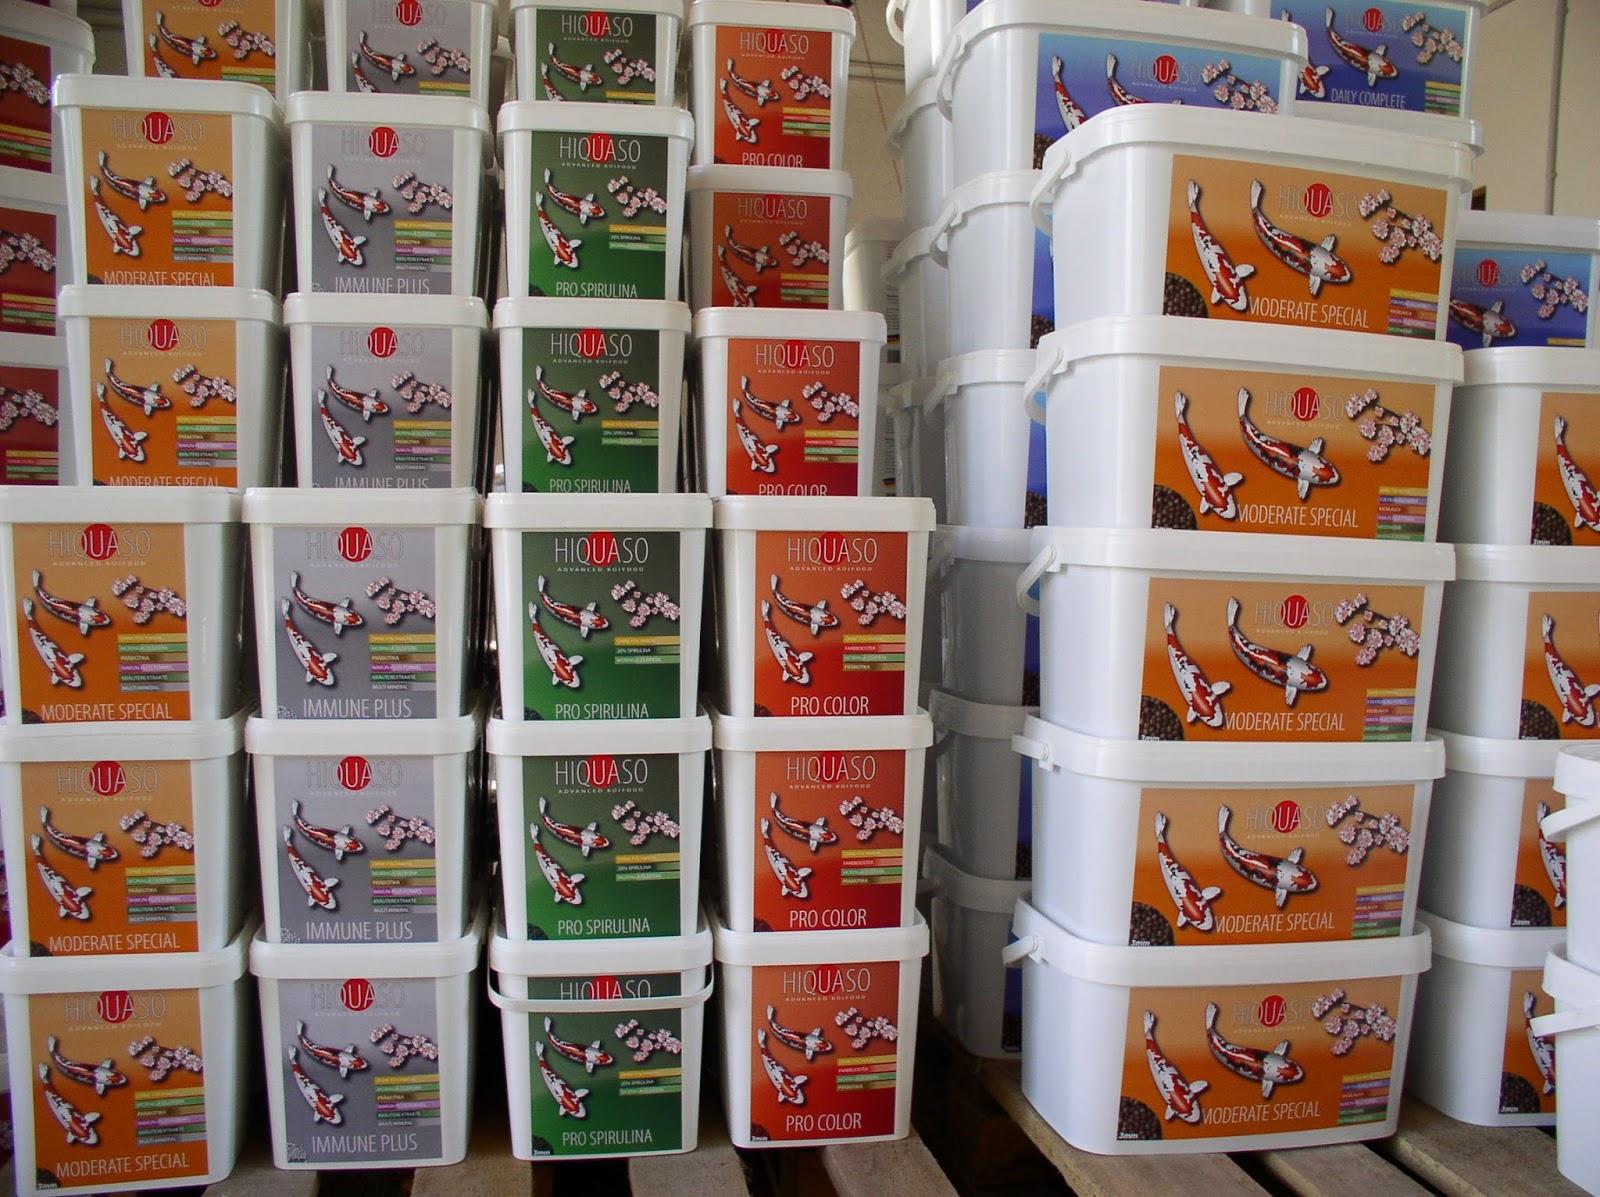 Hiquaso Koifuttersorten, Futter für Koi, Lager mit Koifutter